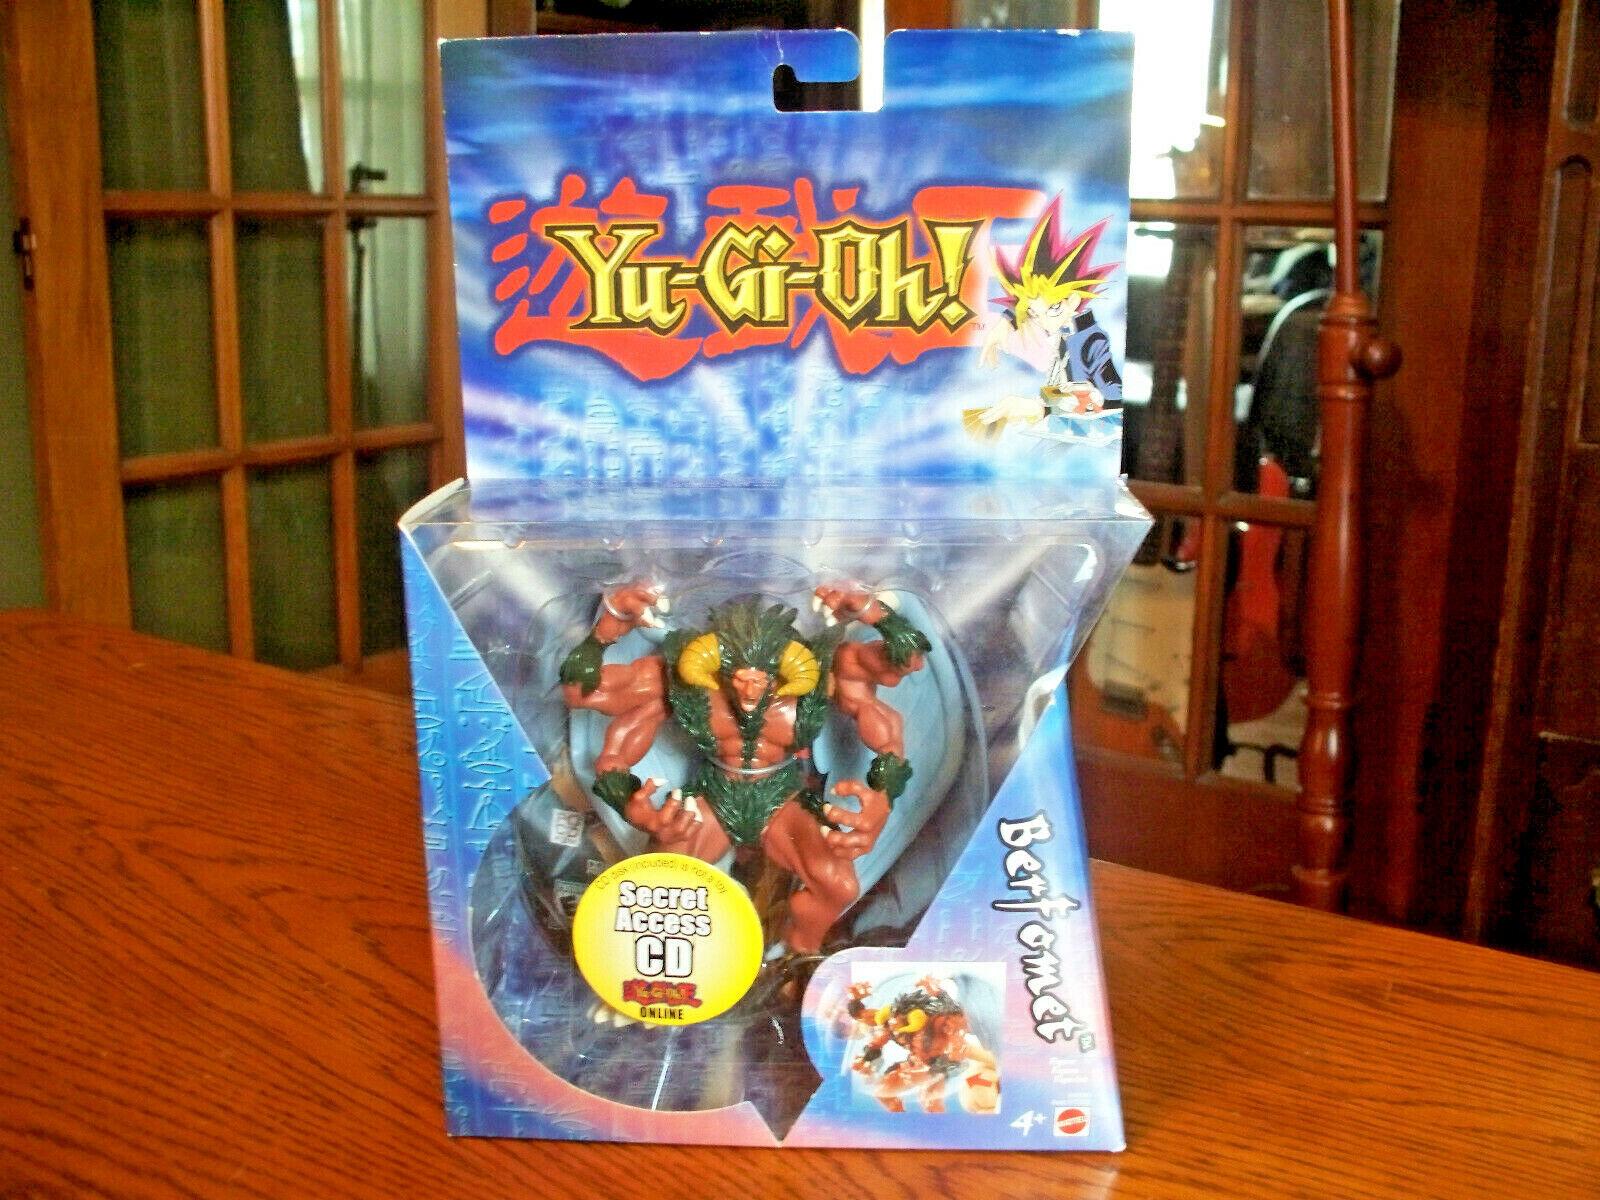 Yu-Gi-Oh  2004 Mattel Berfomet 6  Inch Action Figure Sealed New NIB NRFB